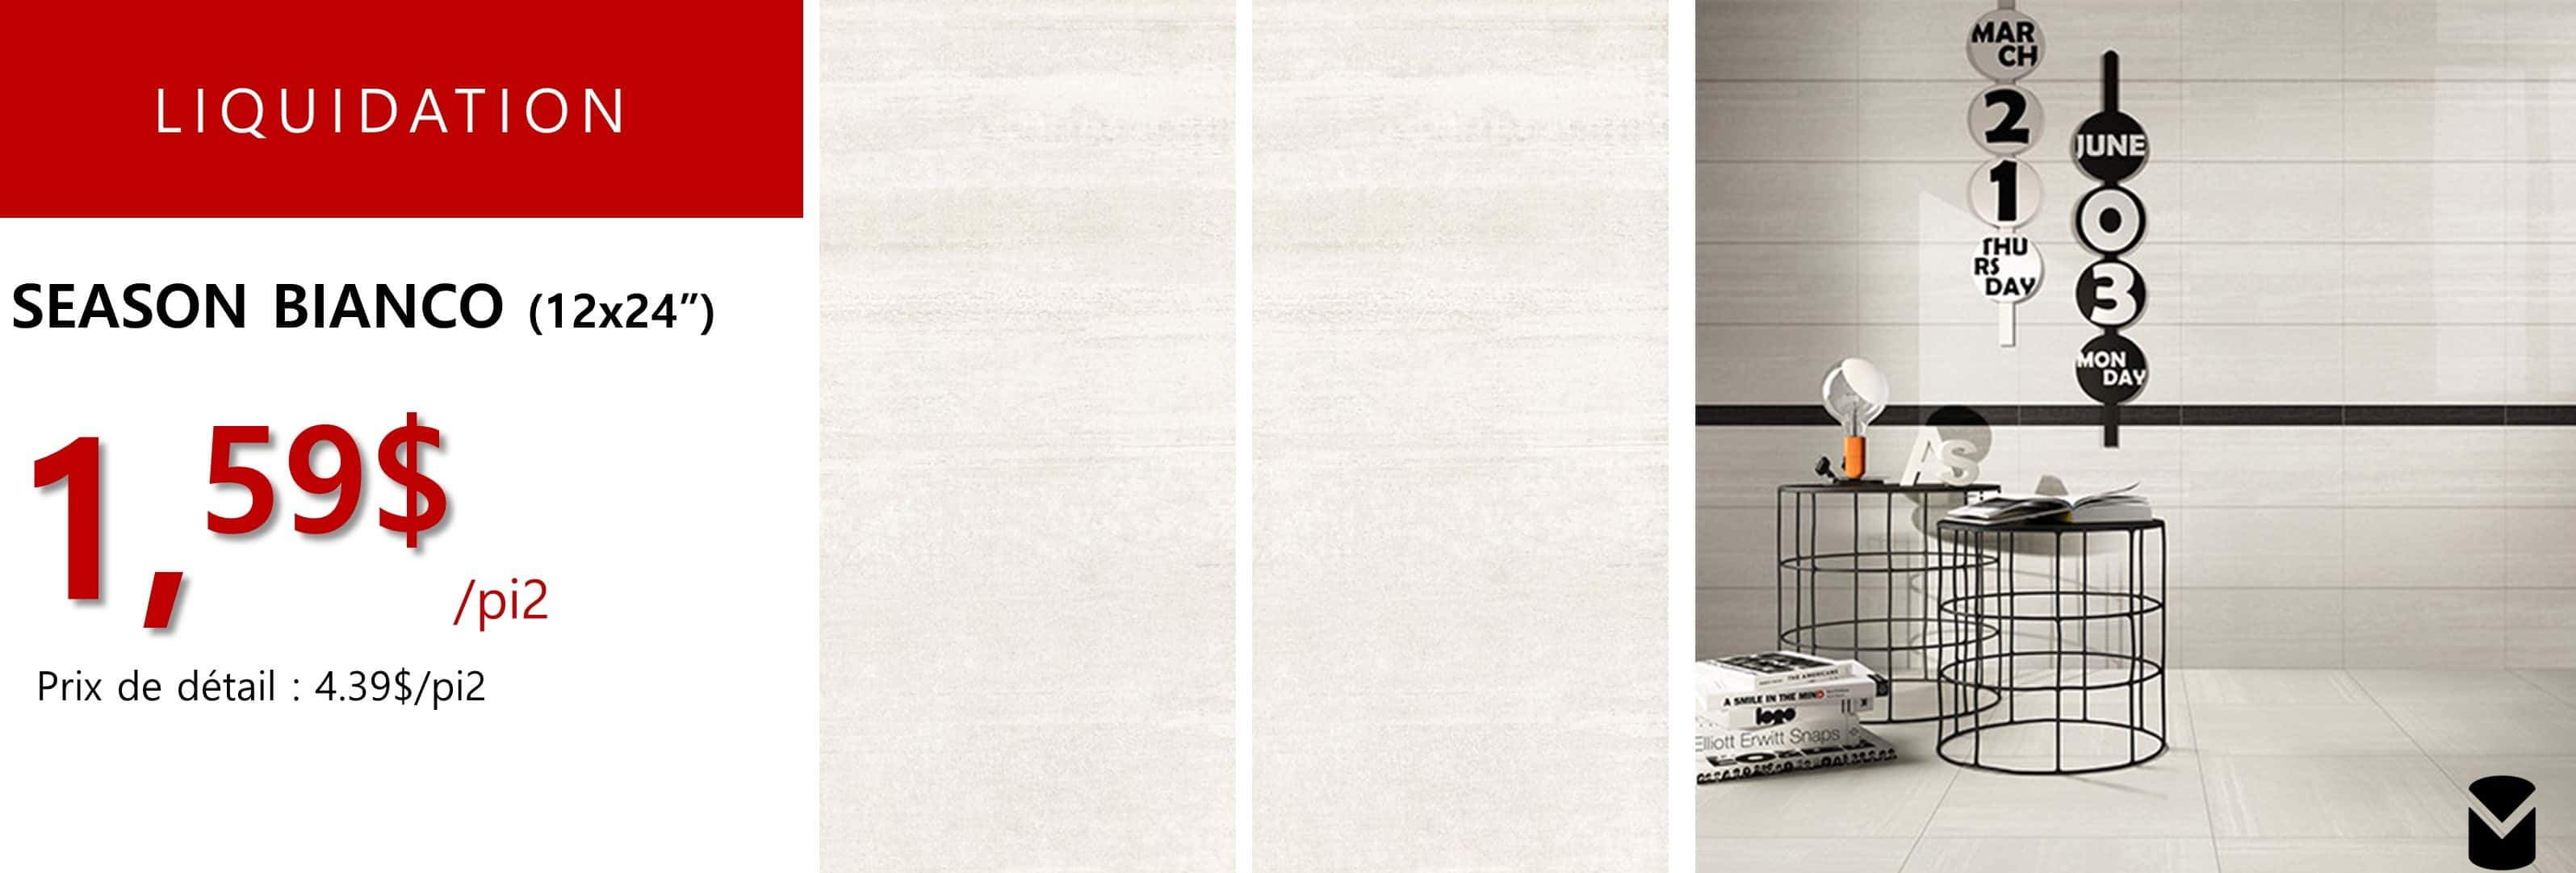 season-bianco-12x24